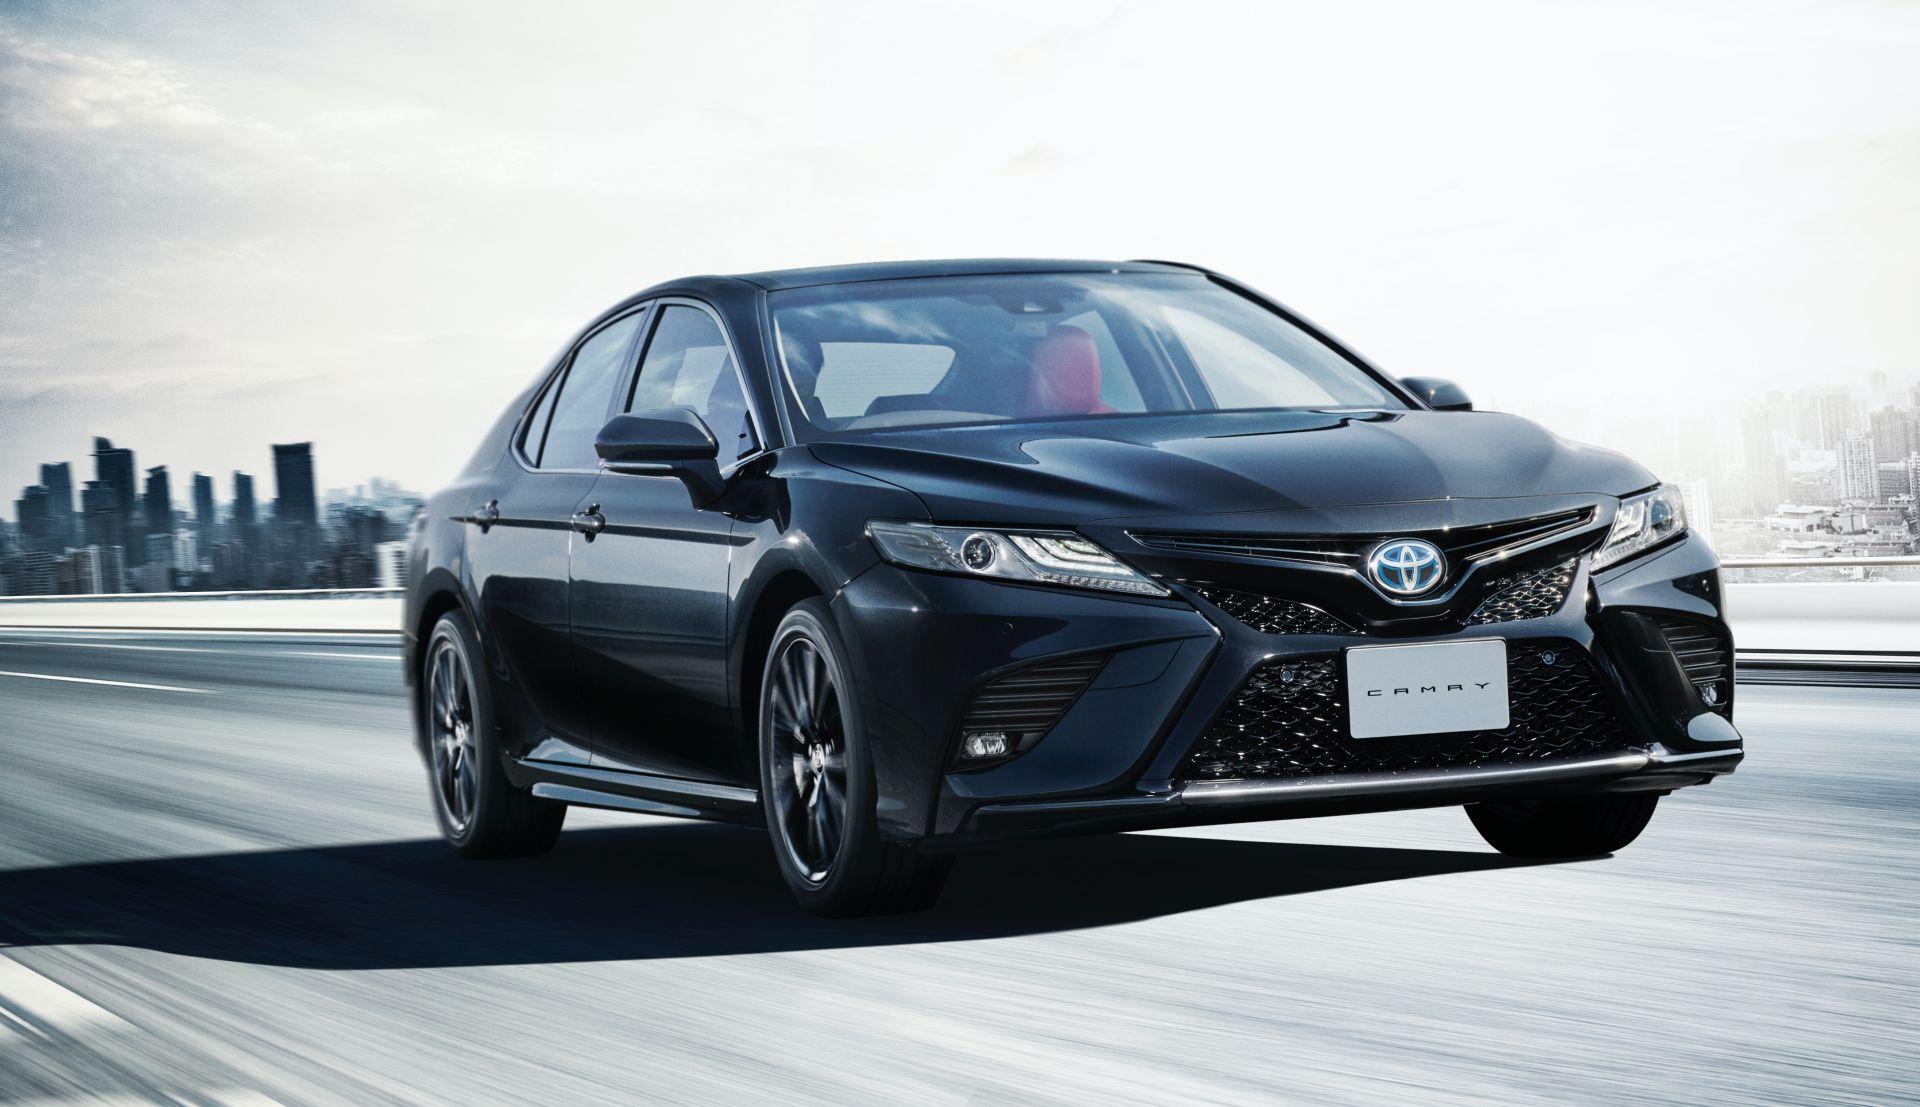 Новая Toyota Camry WS Black Edition 2020—2021